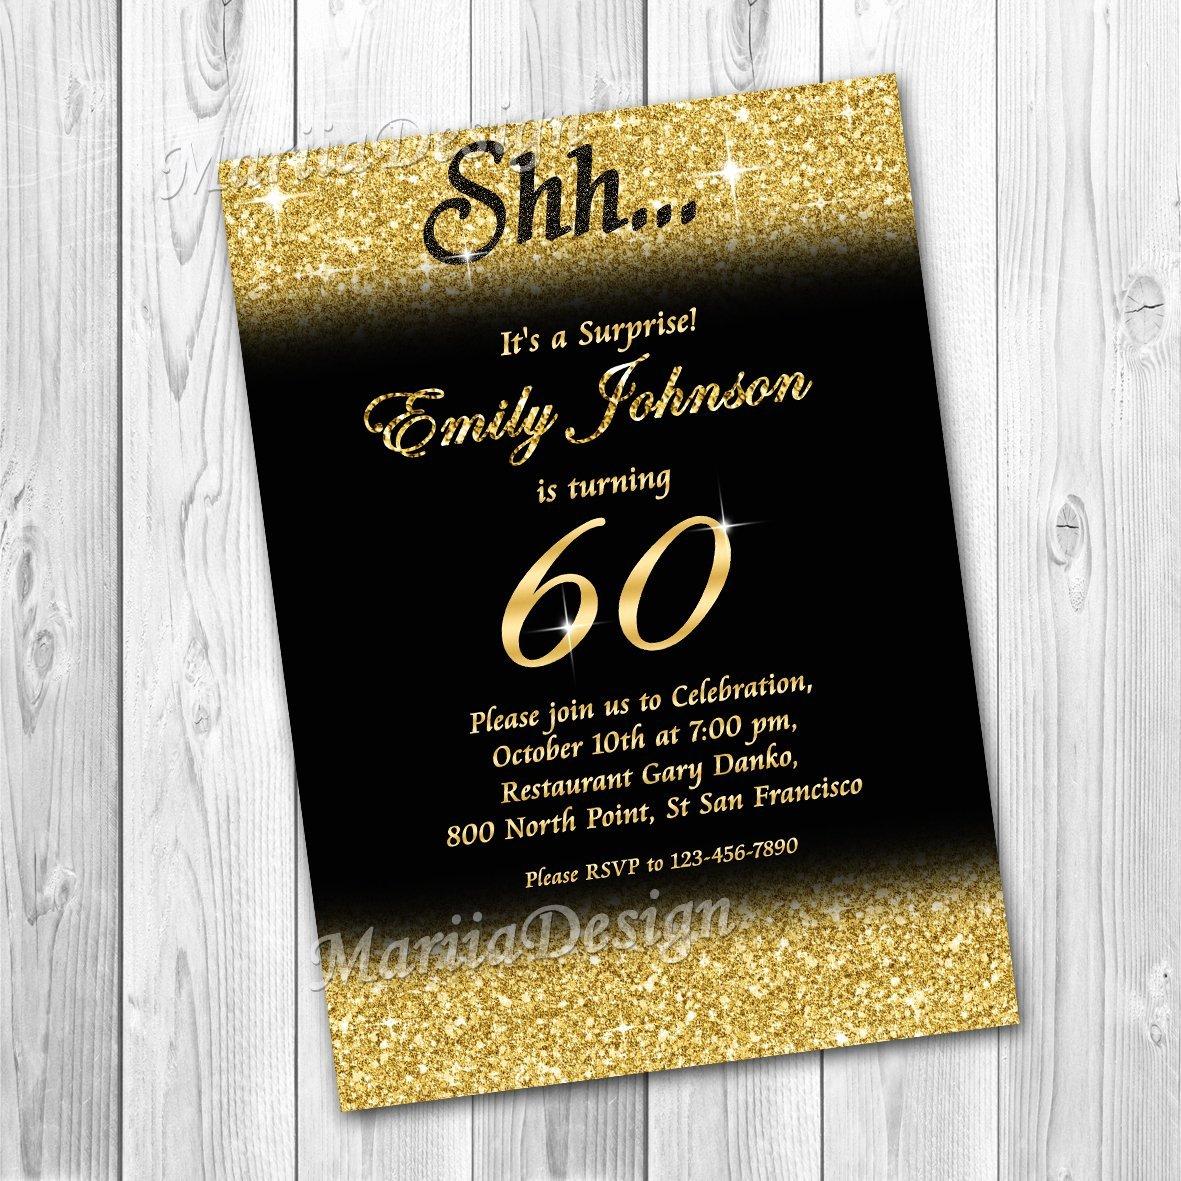 60 Th Birthday Invitation Best Of 50th Birthday Invitation 60th Birthday Invitation Gold